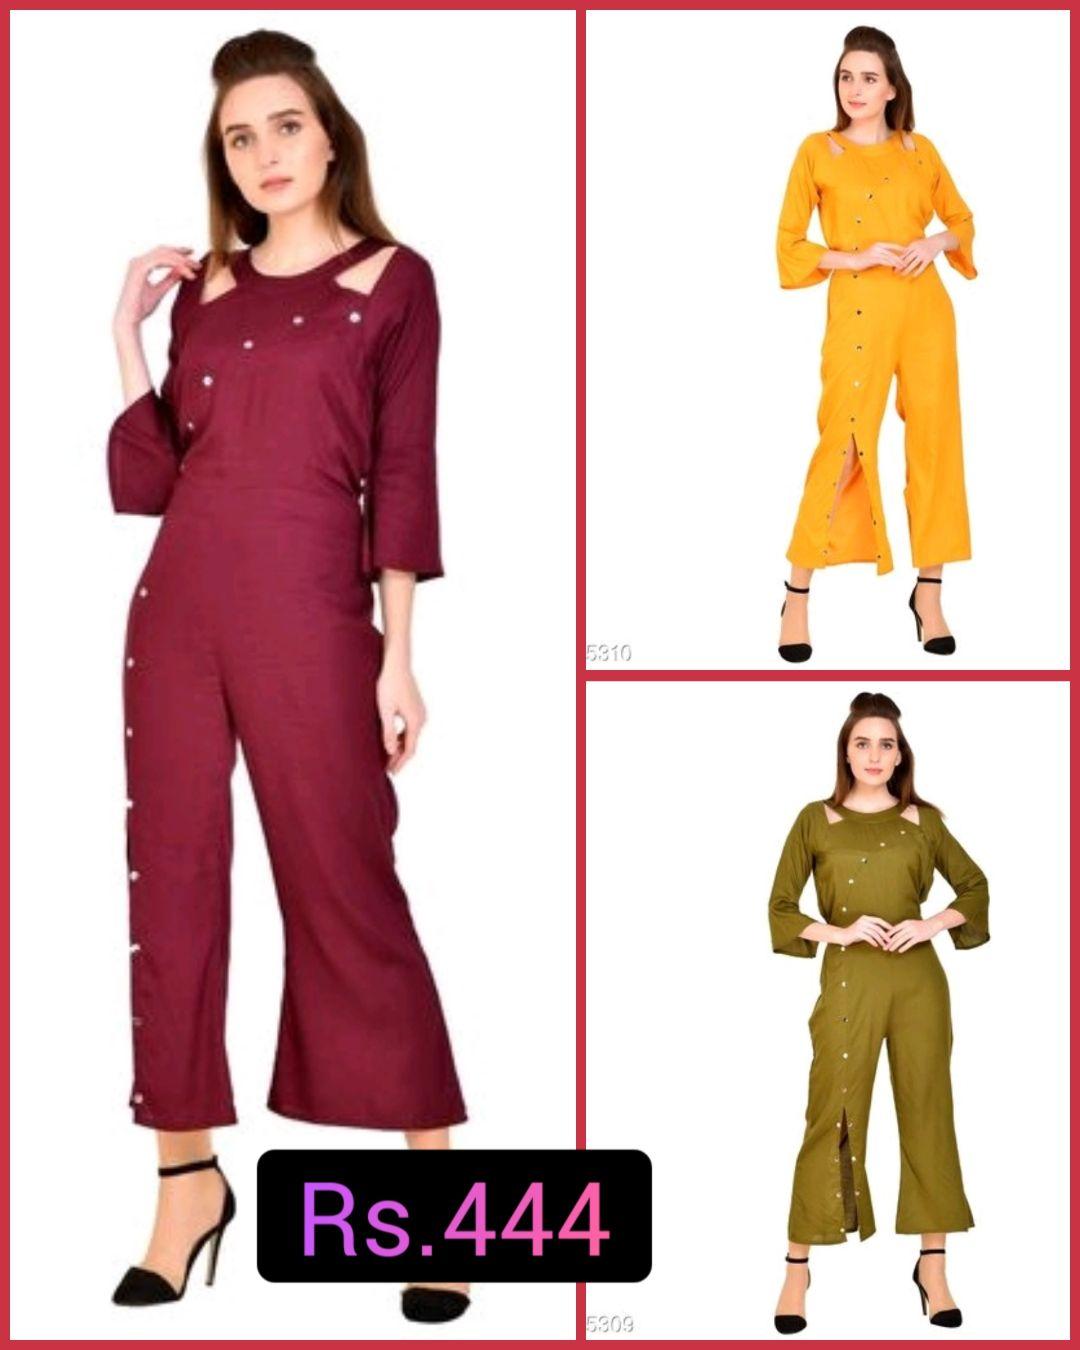 😁 फैशन डिज़ाइनर - 5810 Rs . 444 ESOS - ShareChat